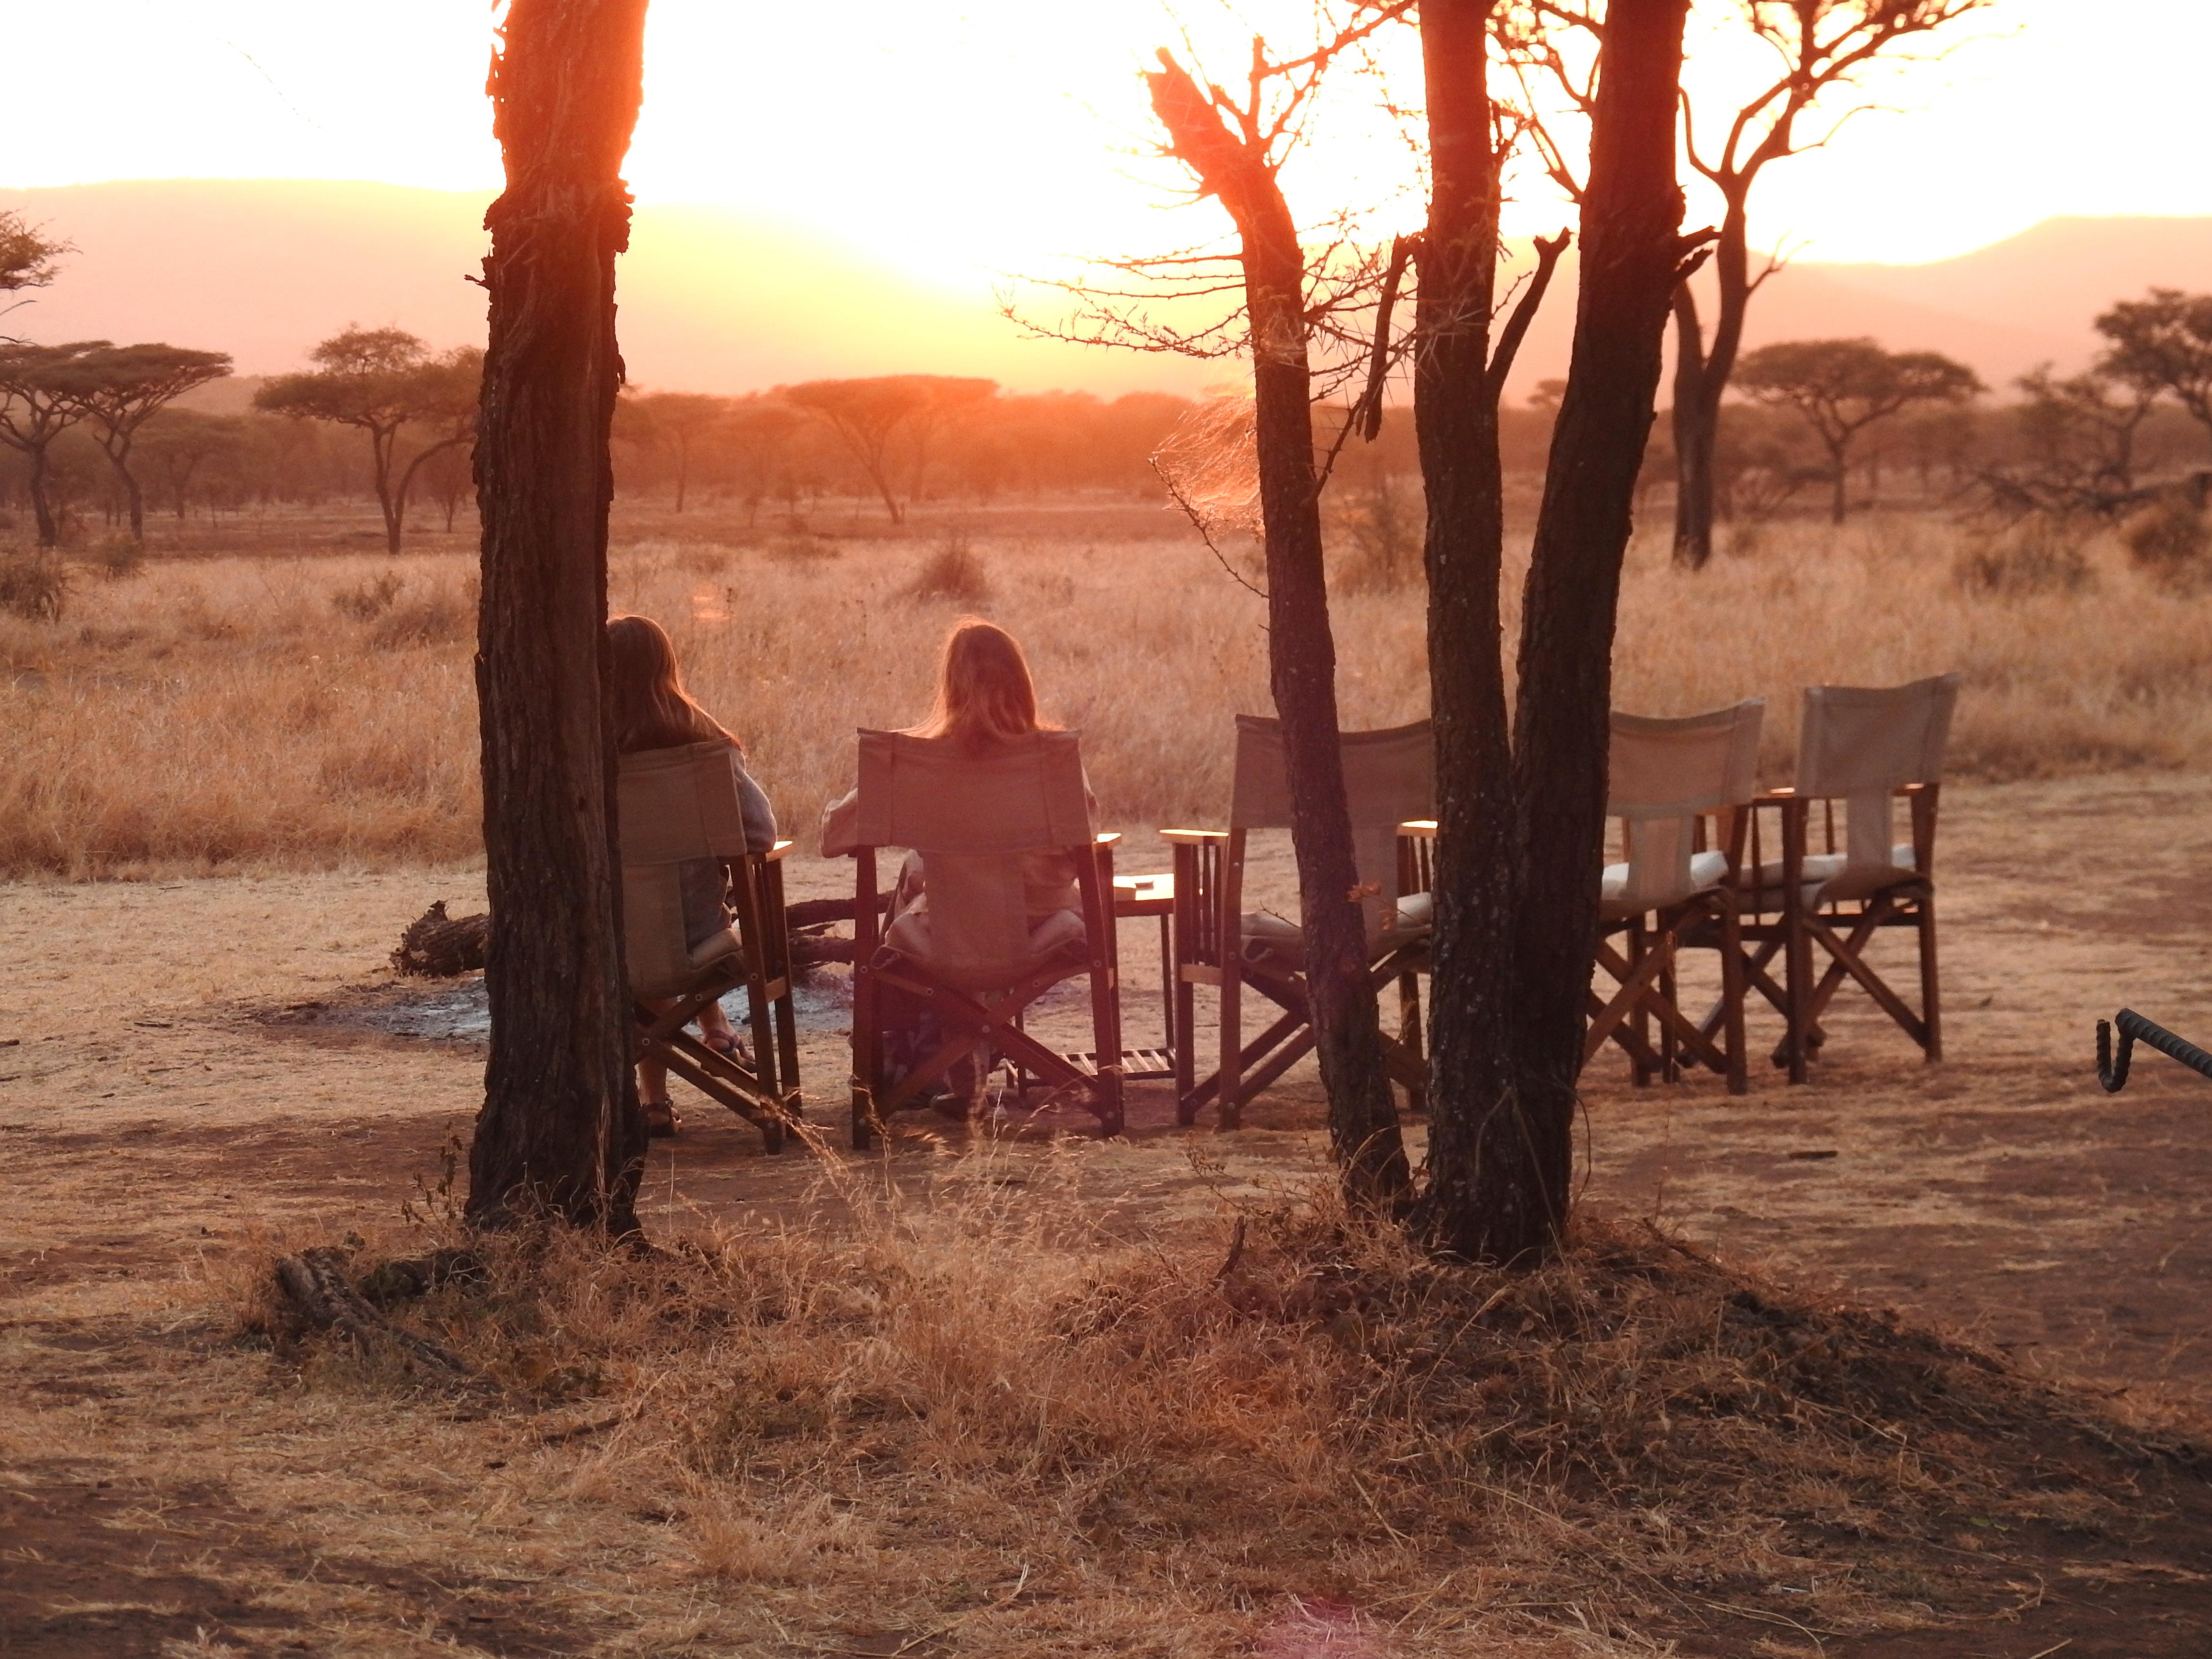 Susie_Terrill_Sunset_tented_camp.jpg